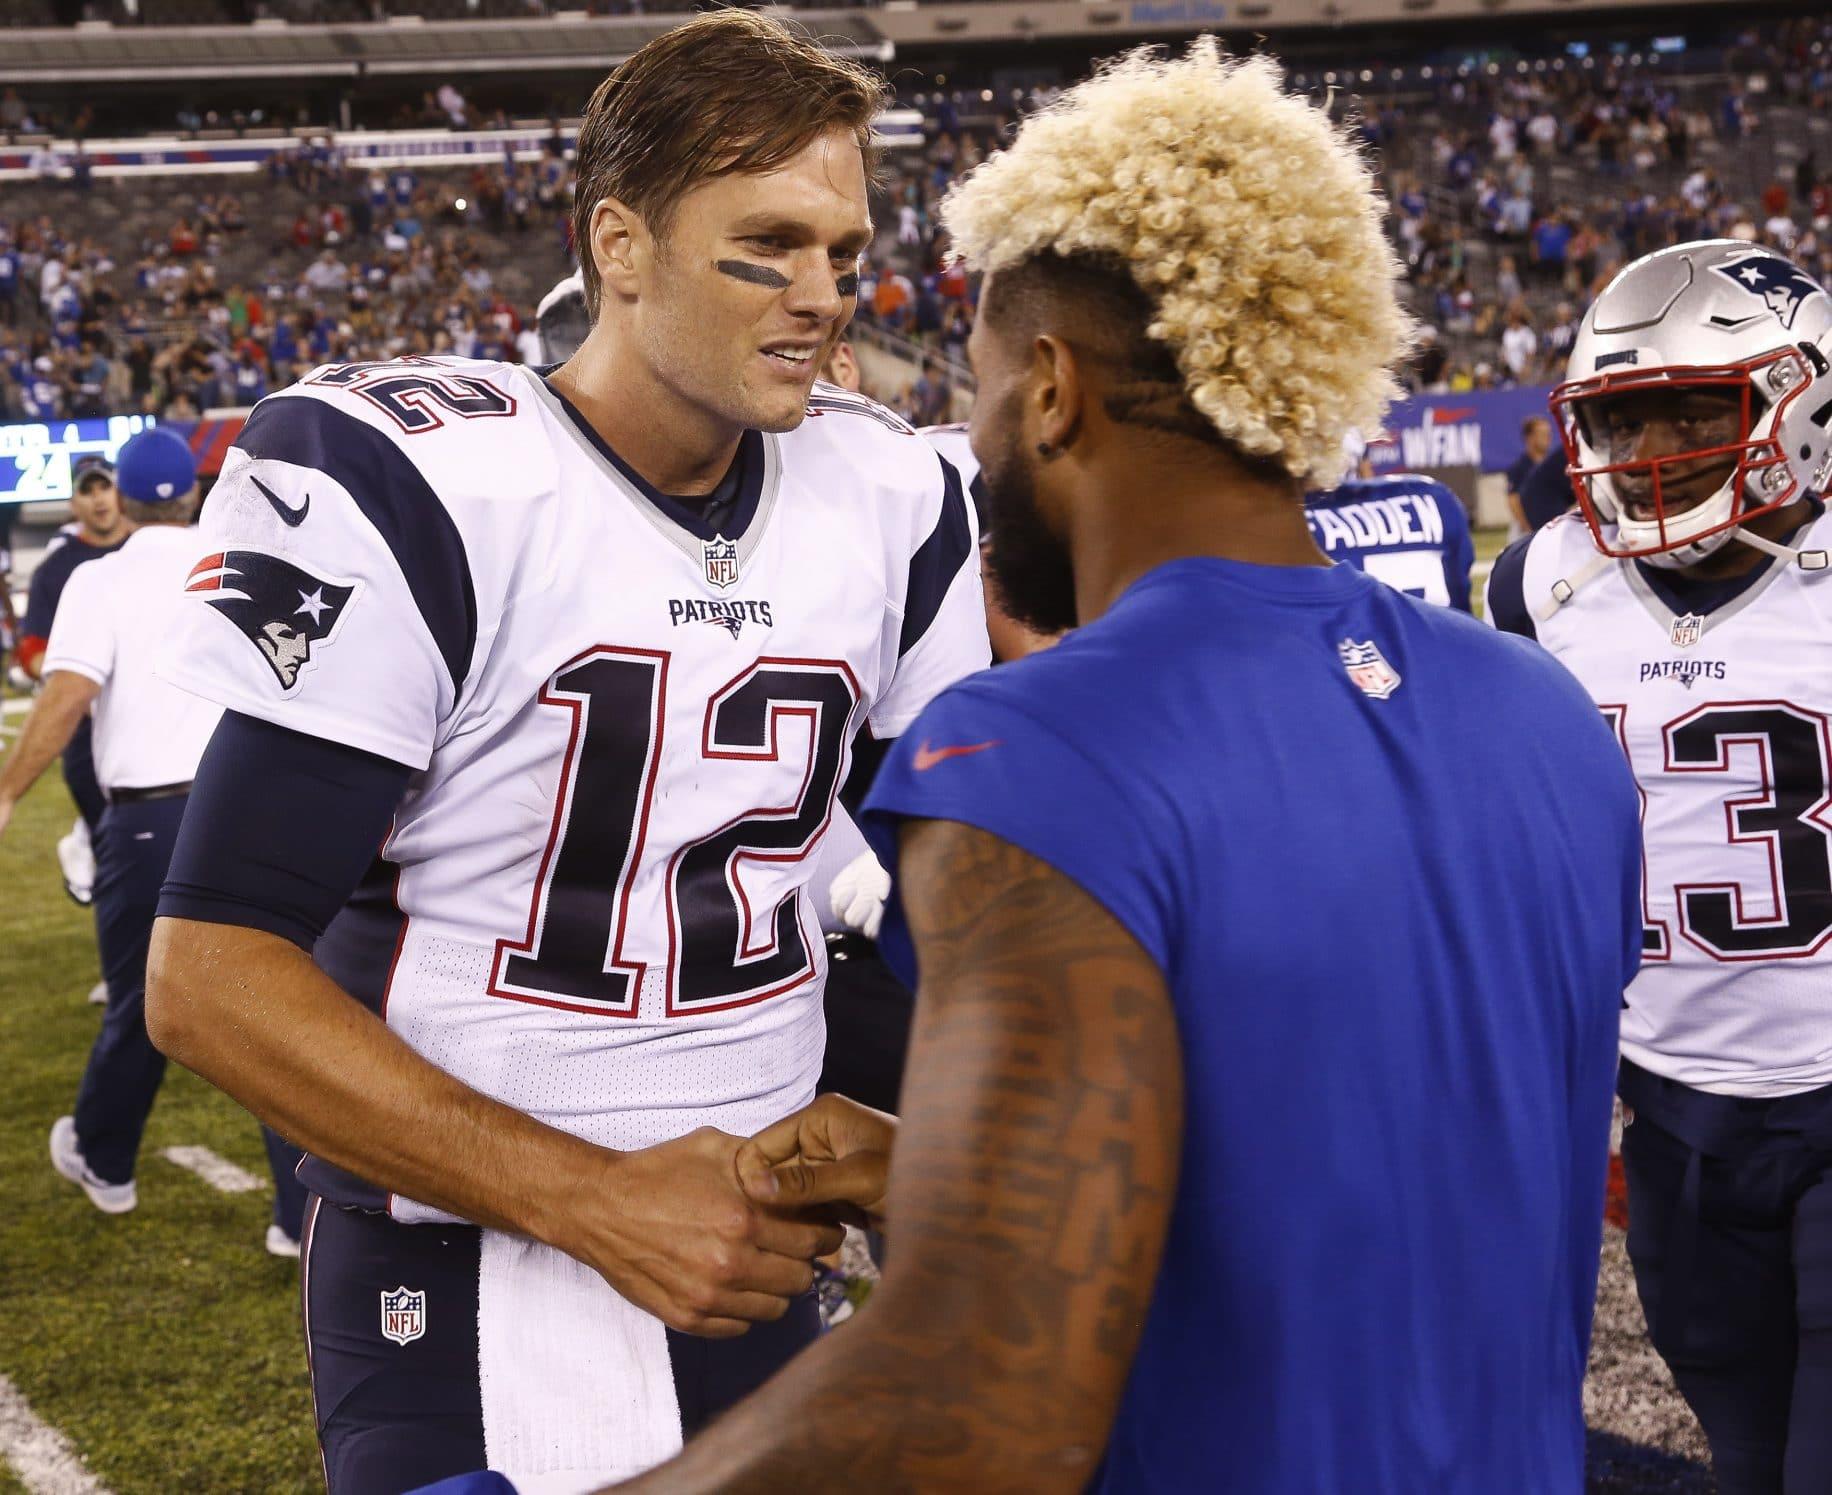 New York Giants: Odell Beckham Jr. compares himself to Tom Brady